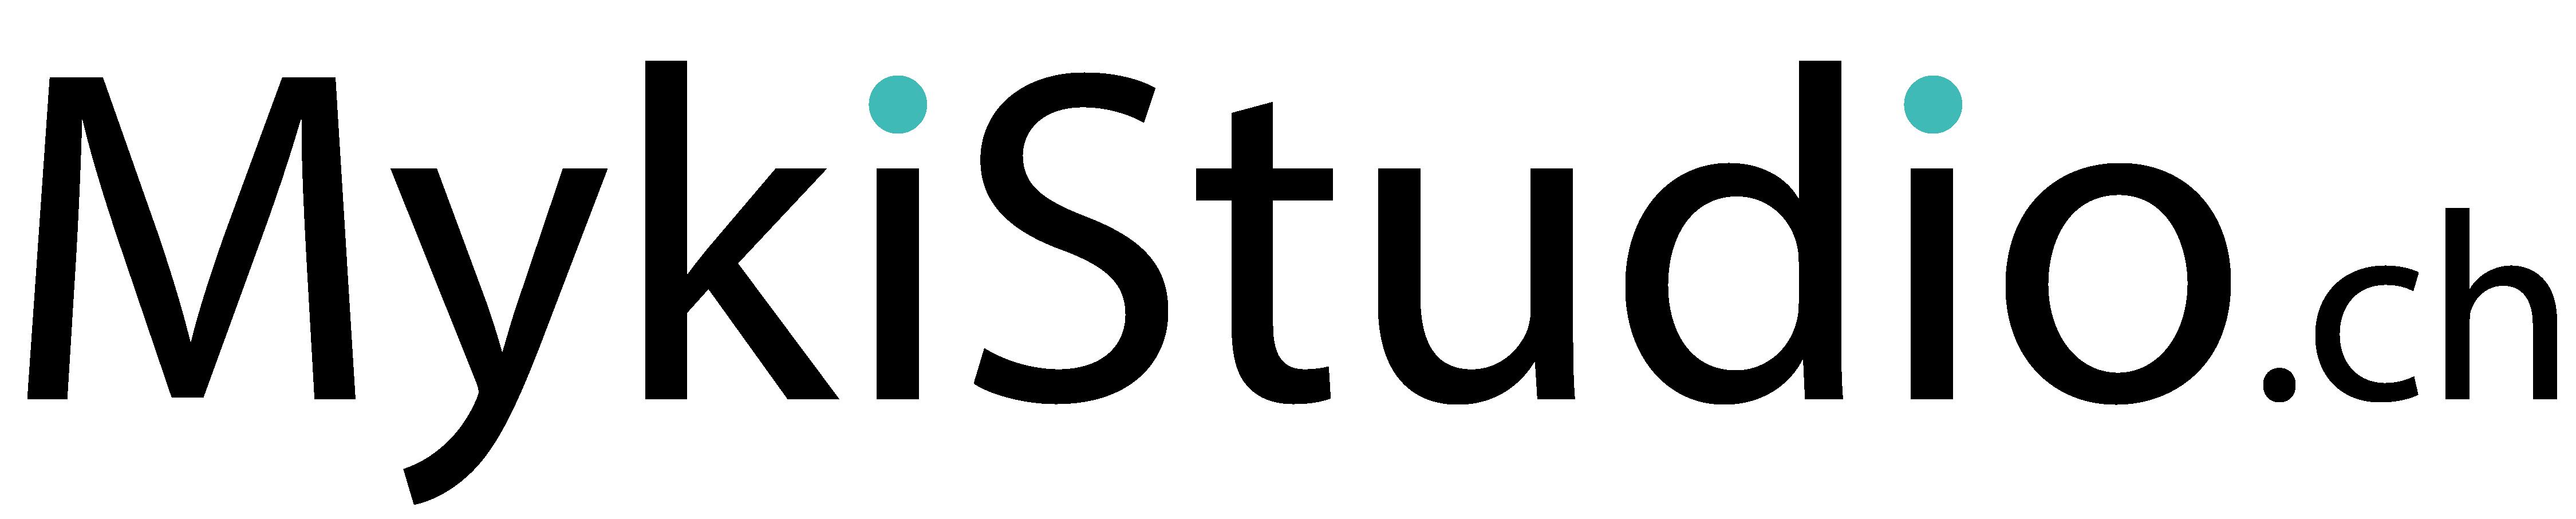 MykiStudio